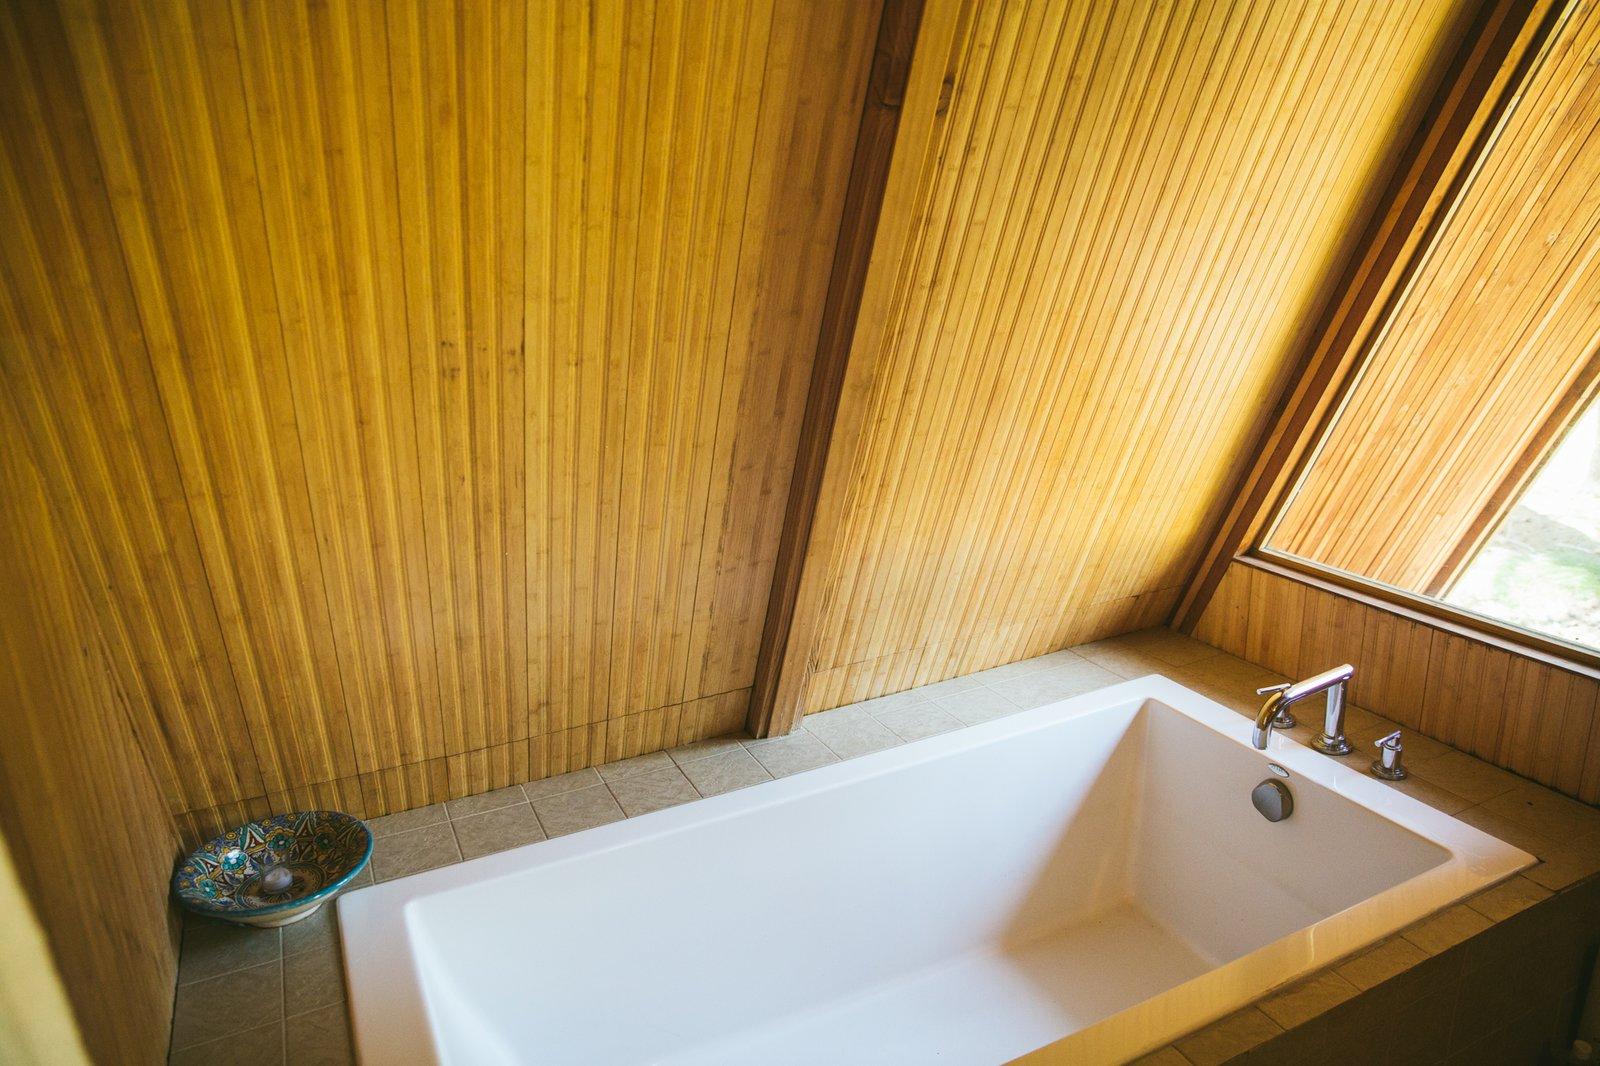 Far Meadow Veronique Lievre Heniz Legle bathroom